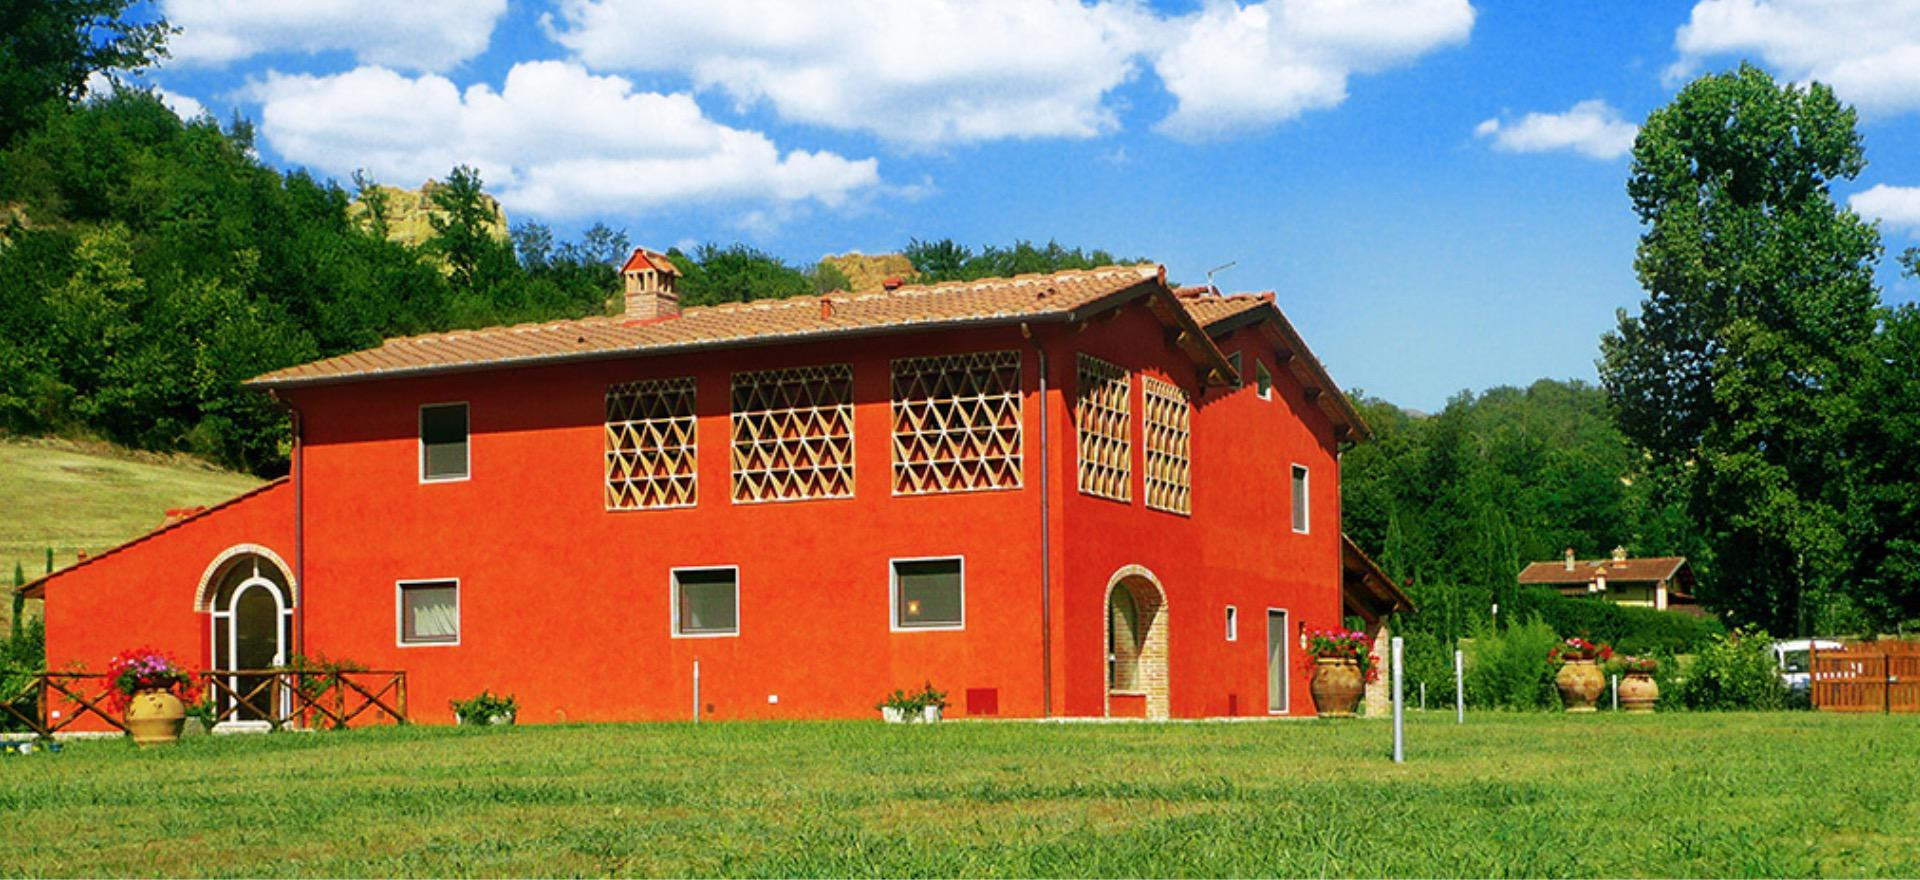 Agriturismo op prachtig landgoed nabij Florence